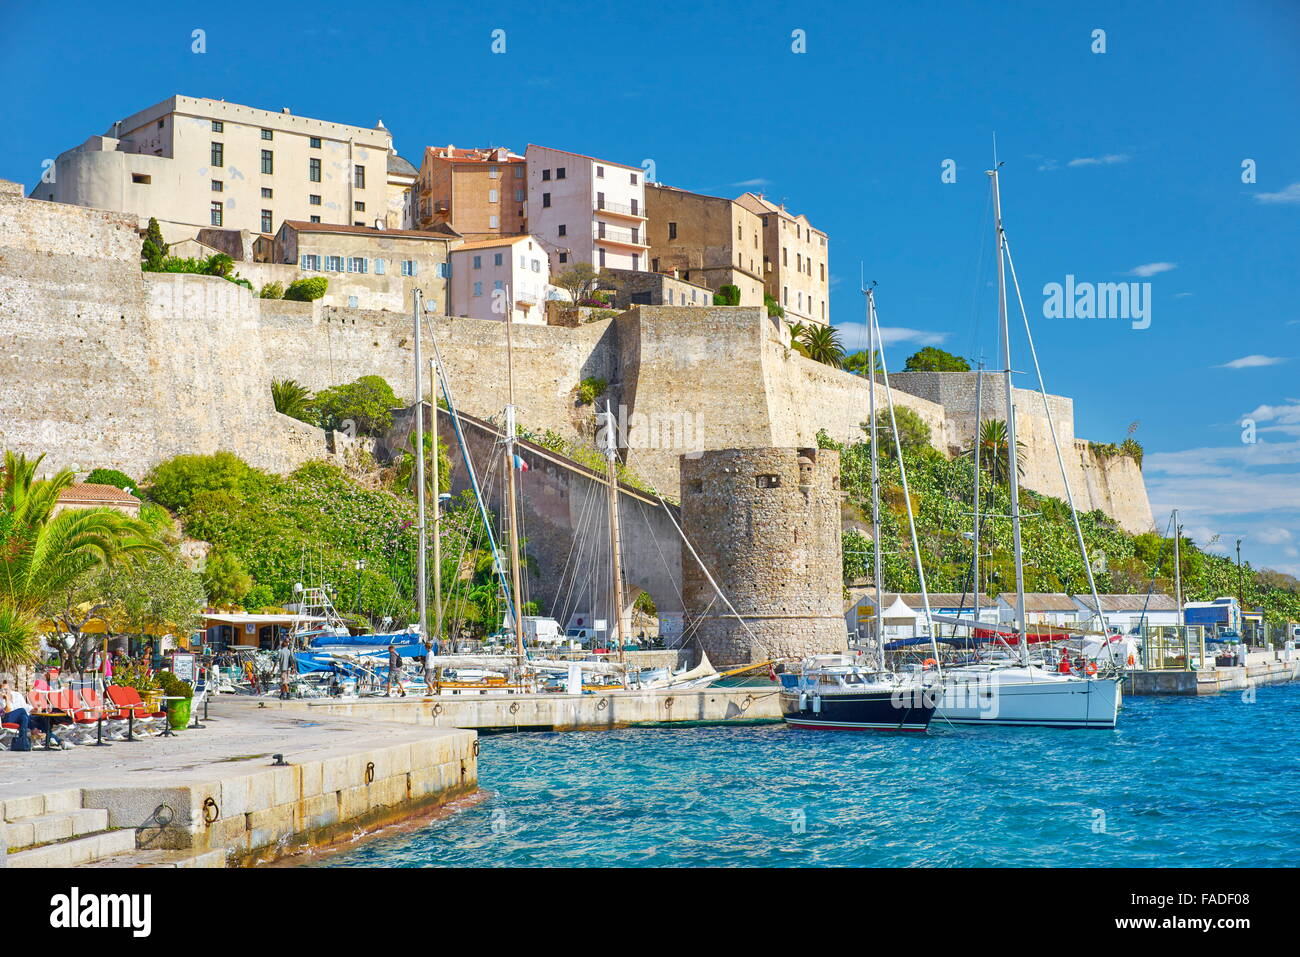 Calvi, view to Citadel, Balagne, Corsica Island, France - Stock Image